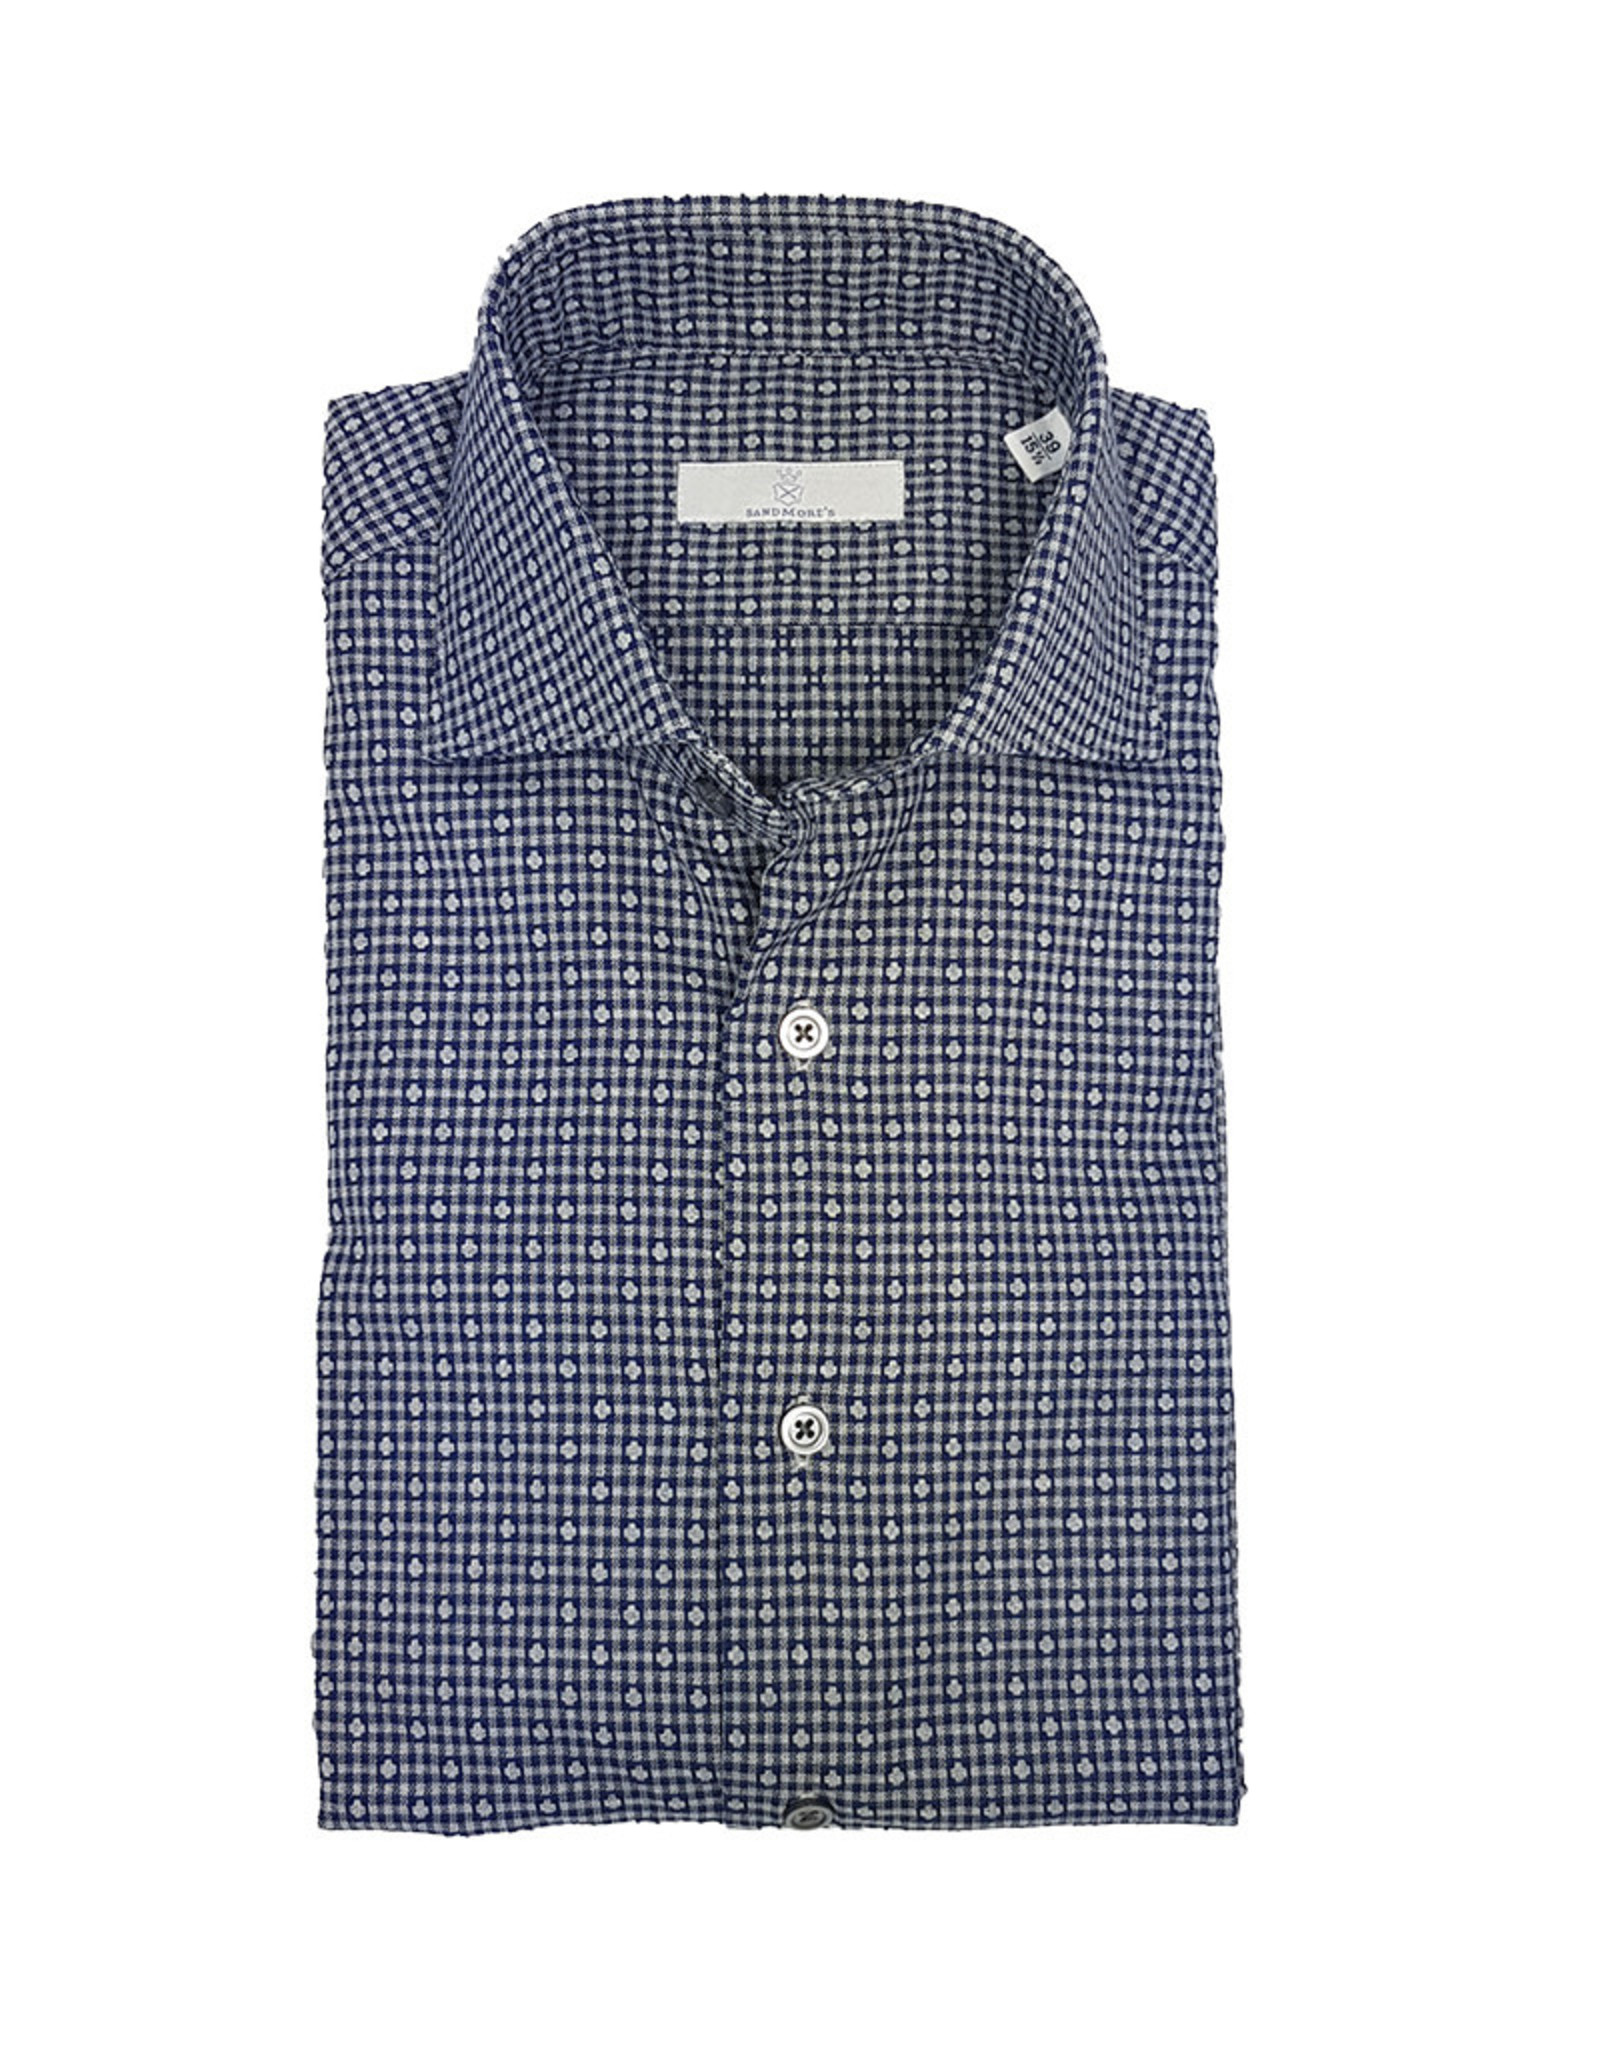 Ghirardelli Sandmore's hemd blauw-grijs Slimline  E1133